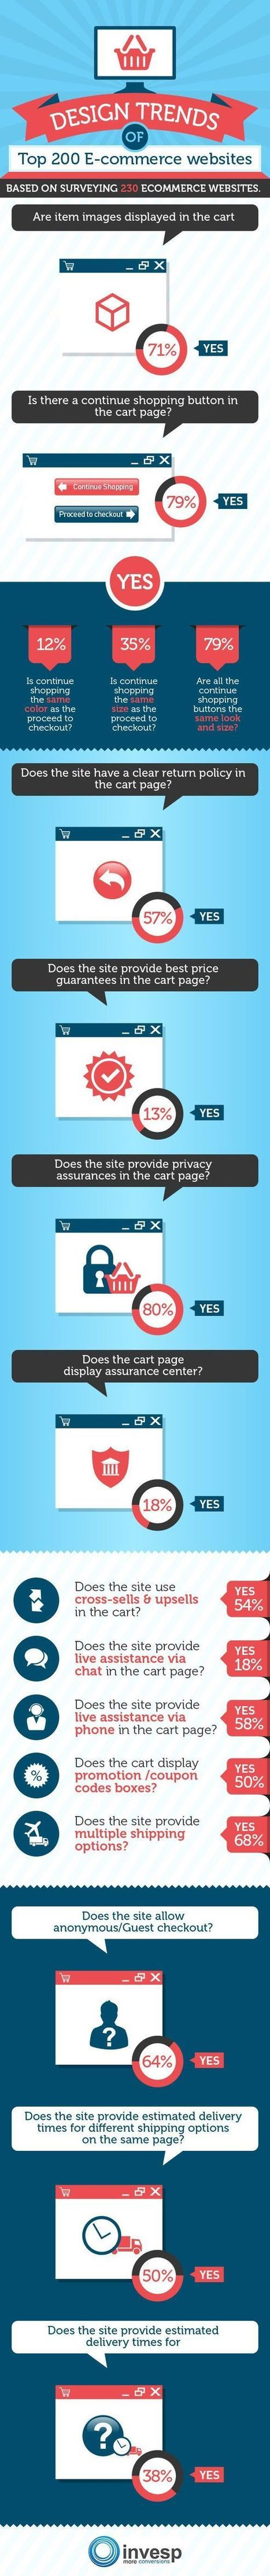 14 Ecommerce Checkout Design Trends Among Top 200 Online Merchants [Infographic] | Ecom Revolution | Scoop.it